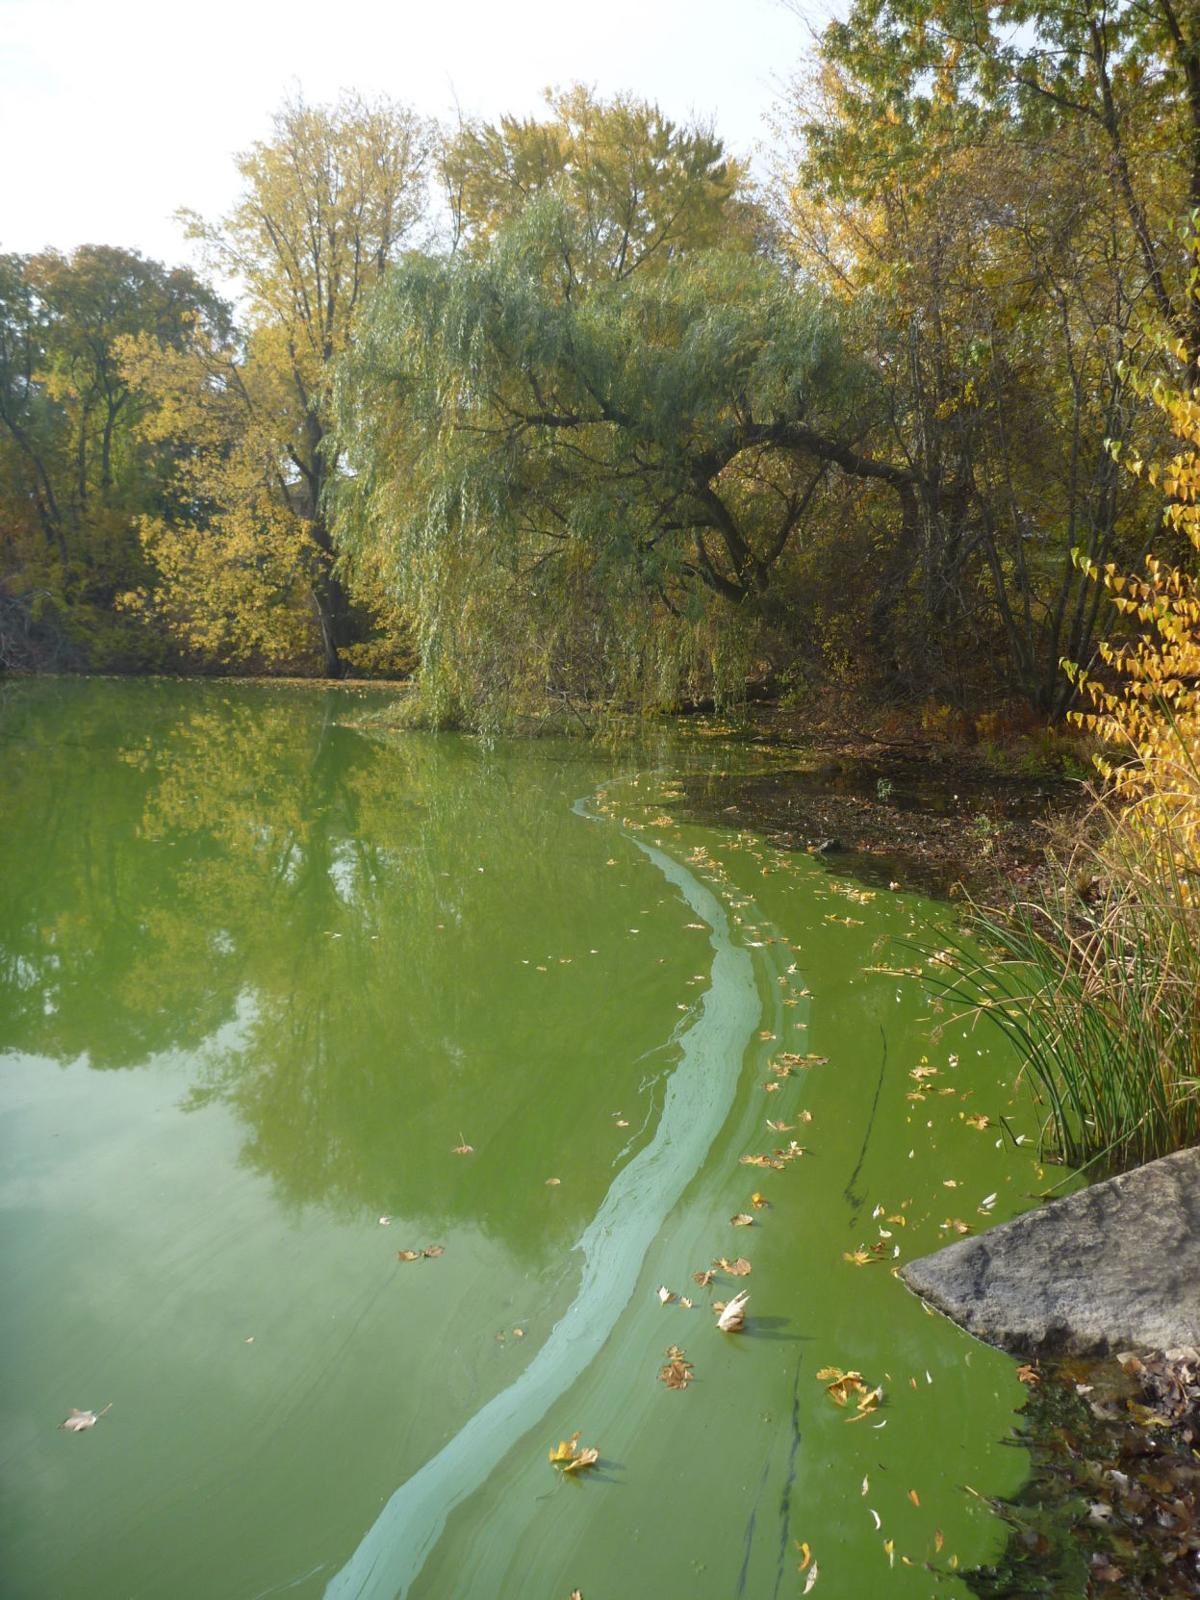 062629 REG algae in ponds submitted by RIDEM (2).JPG